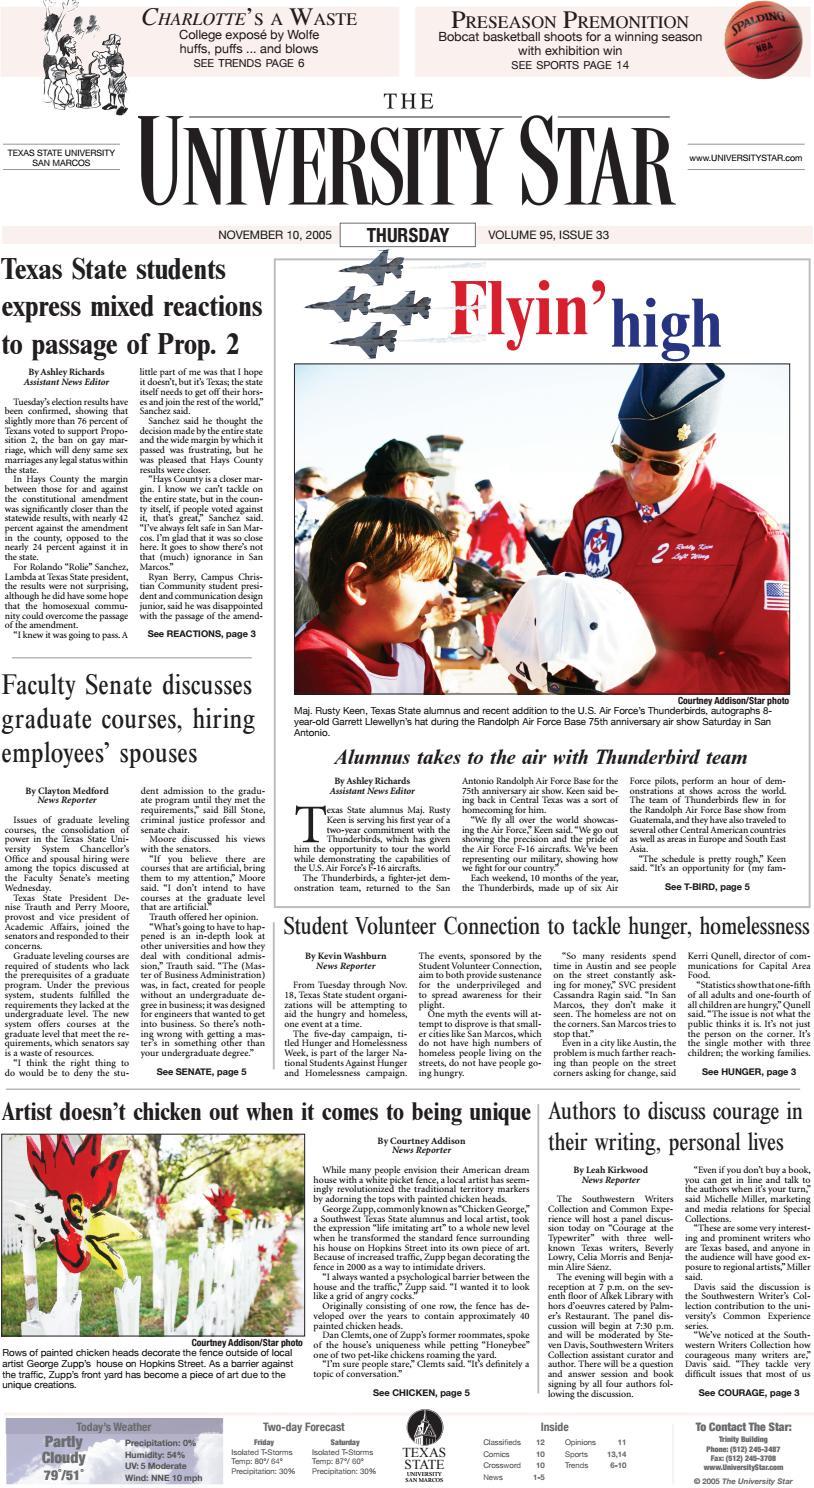 1debb622019 11 10 2005 by The University Star - issuu